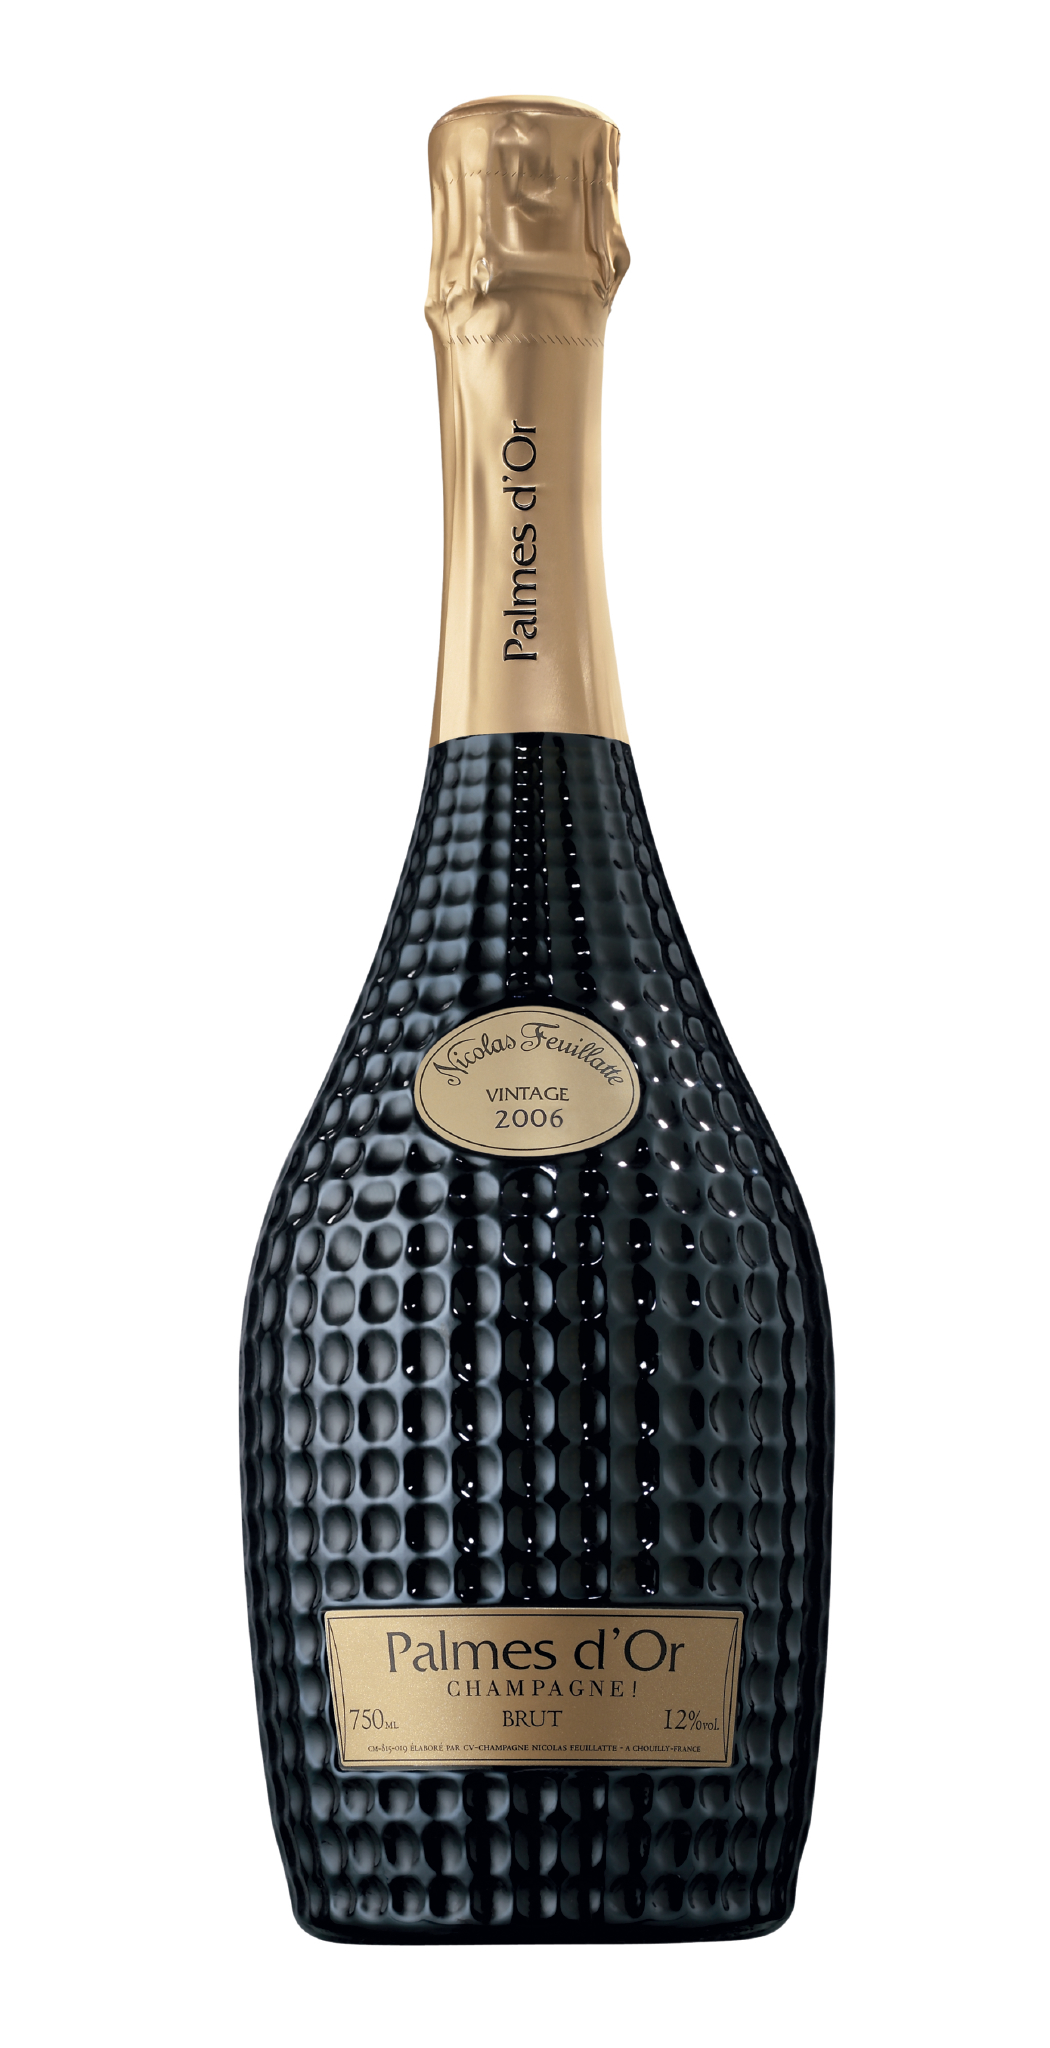 Champagne Nicolas Feuillatte's Palmes d'Or